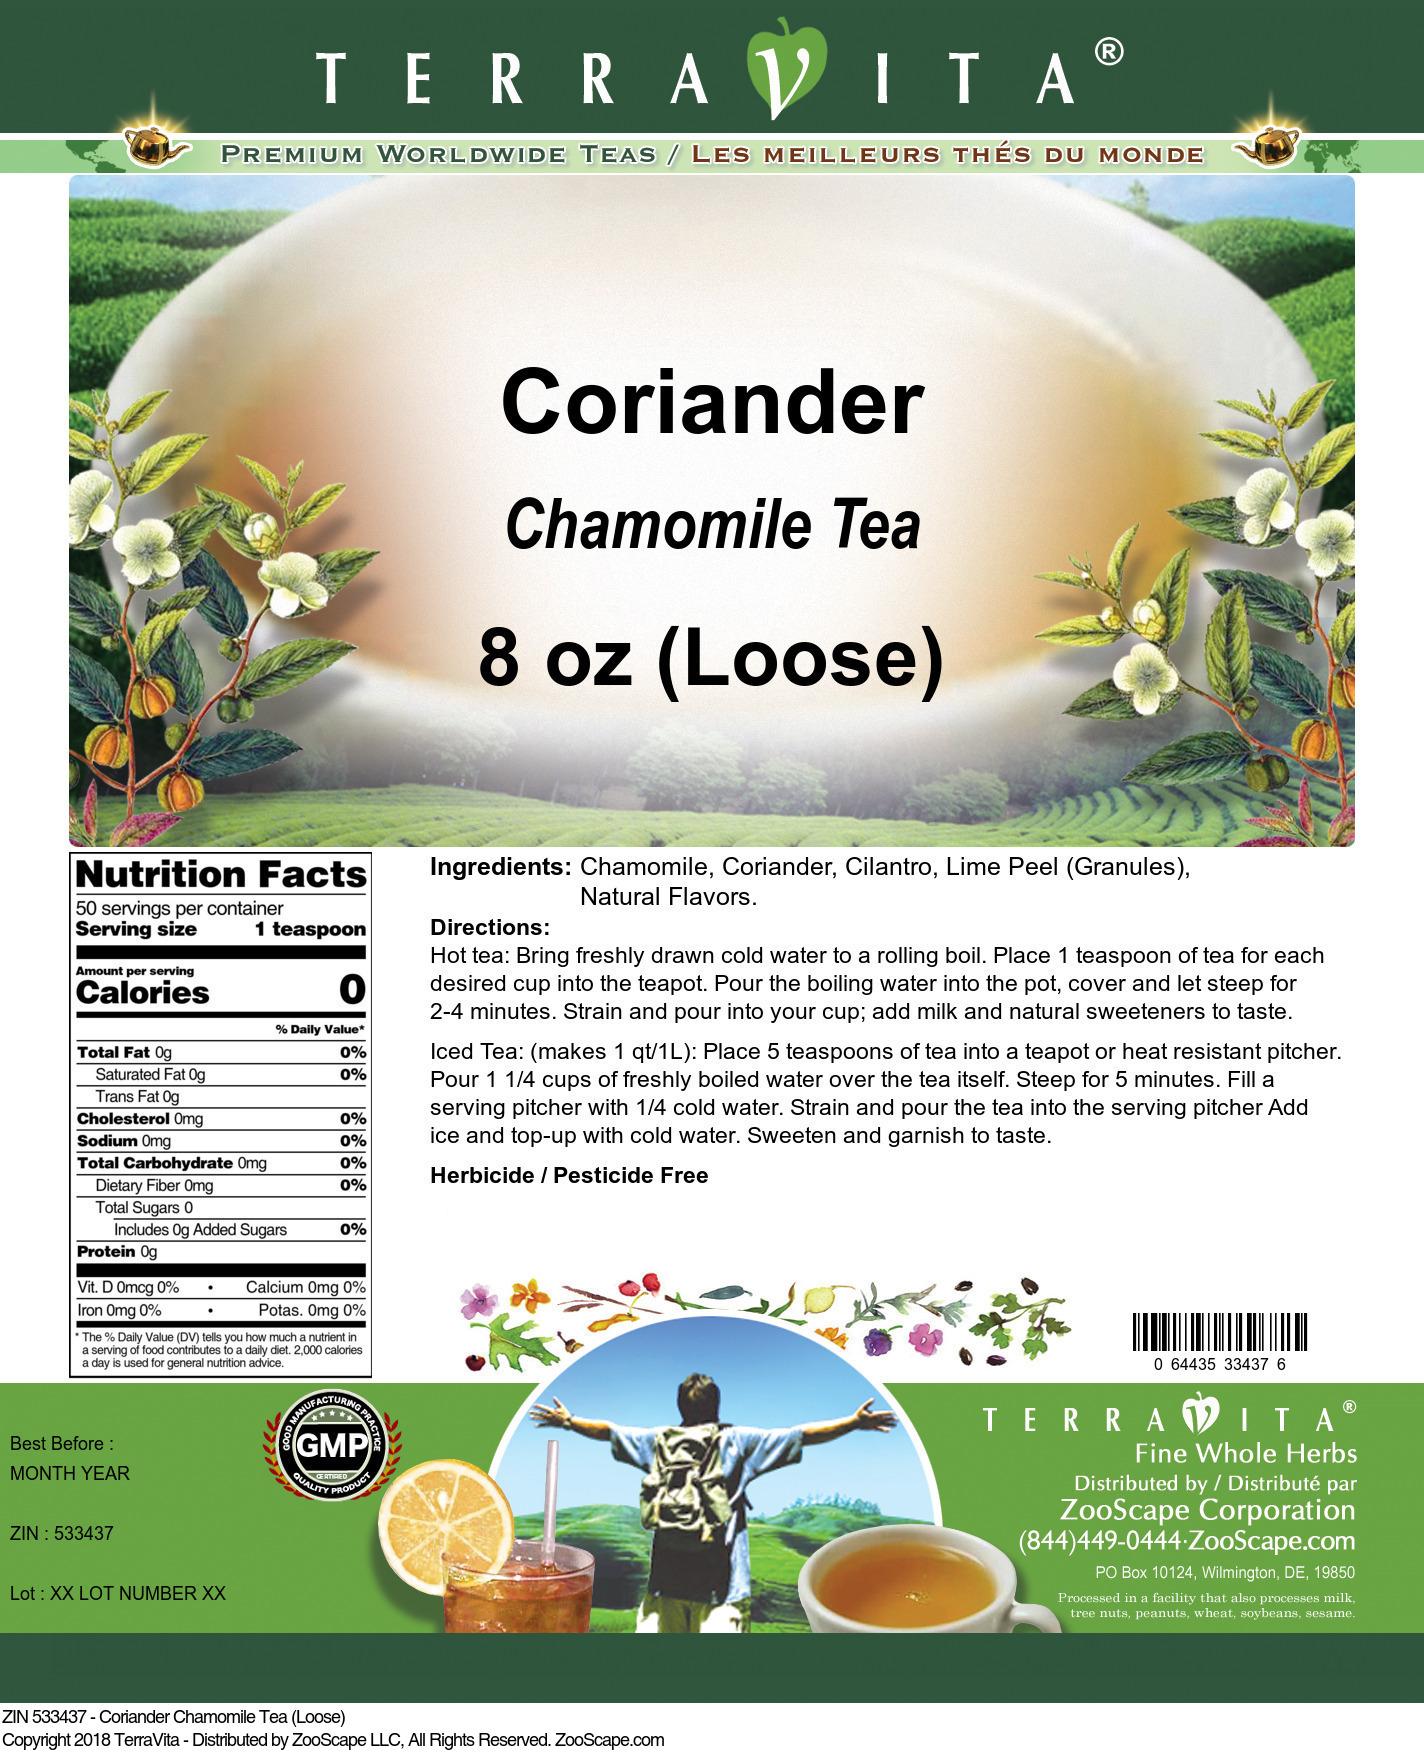 Coriander Chamomile Tea